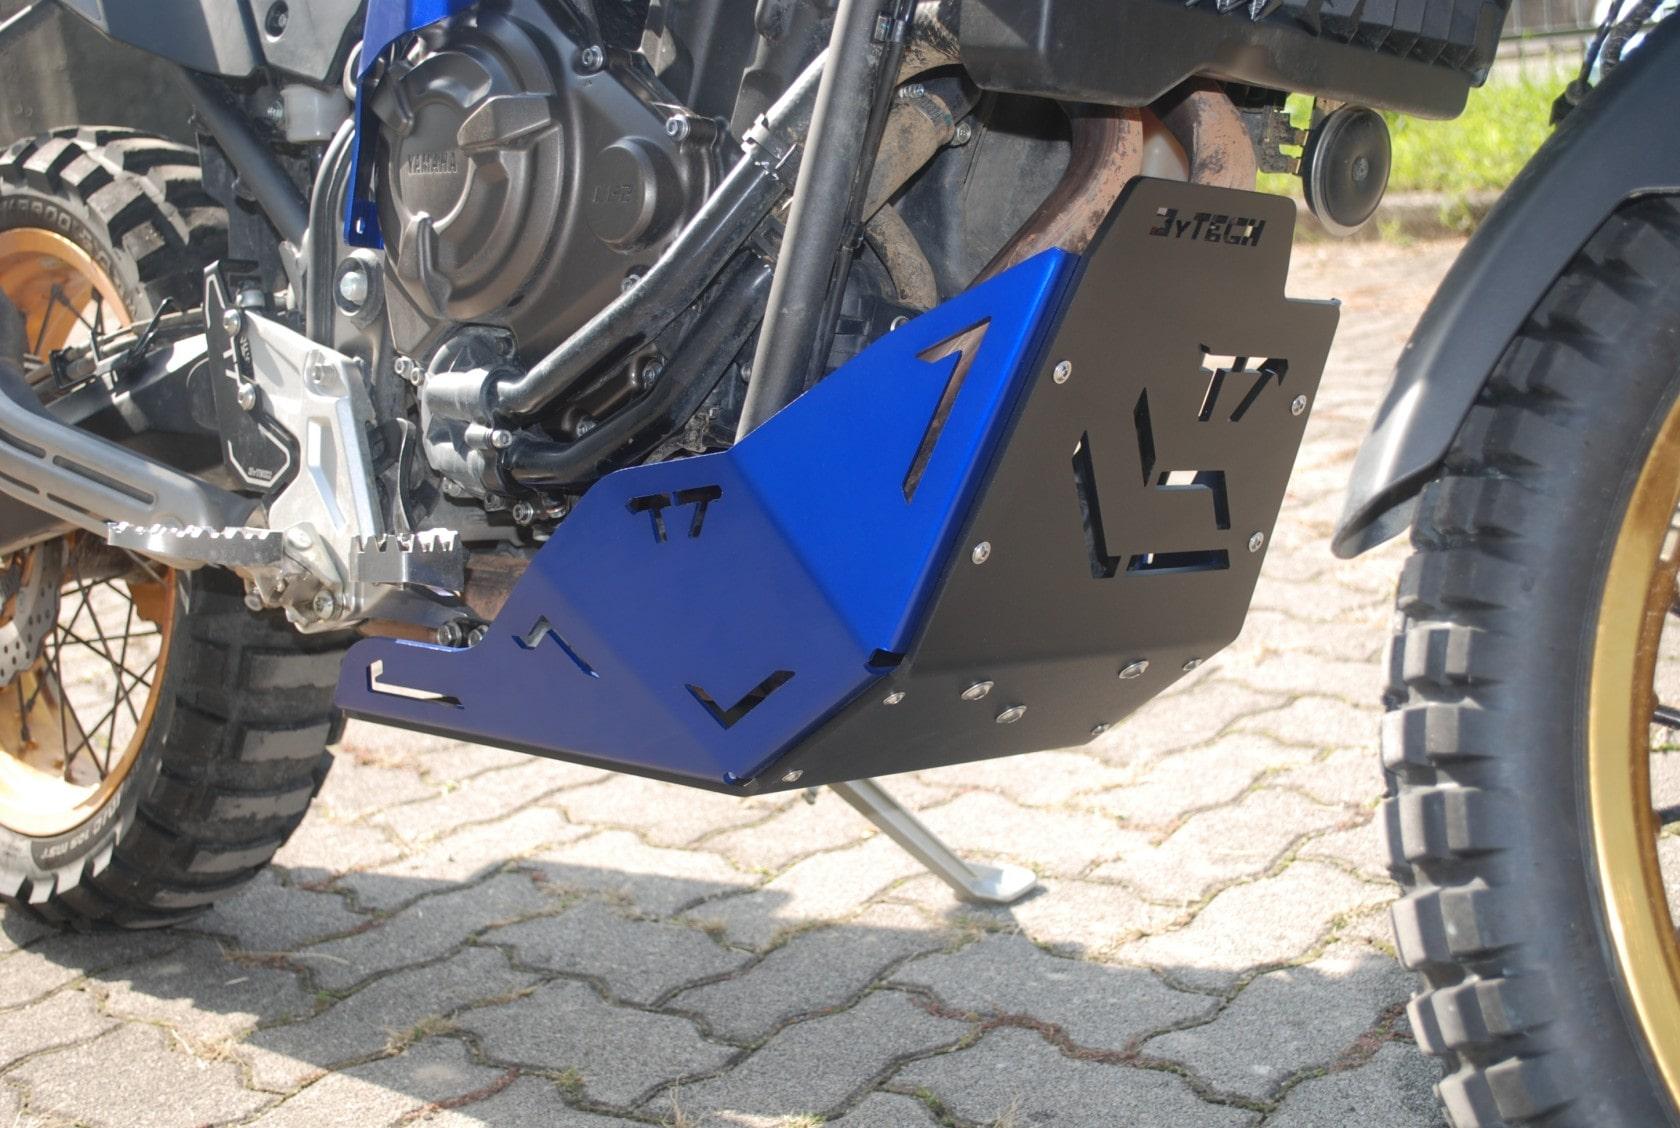 YAM304BV-Yamaha-Tenere-700-Motorschutzplatte-vorne-schwarz-blau-MyTech5f928cfc79513_1680x1680-min